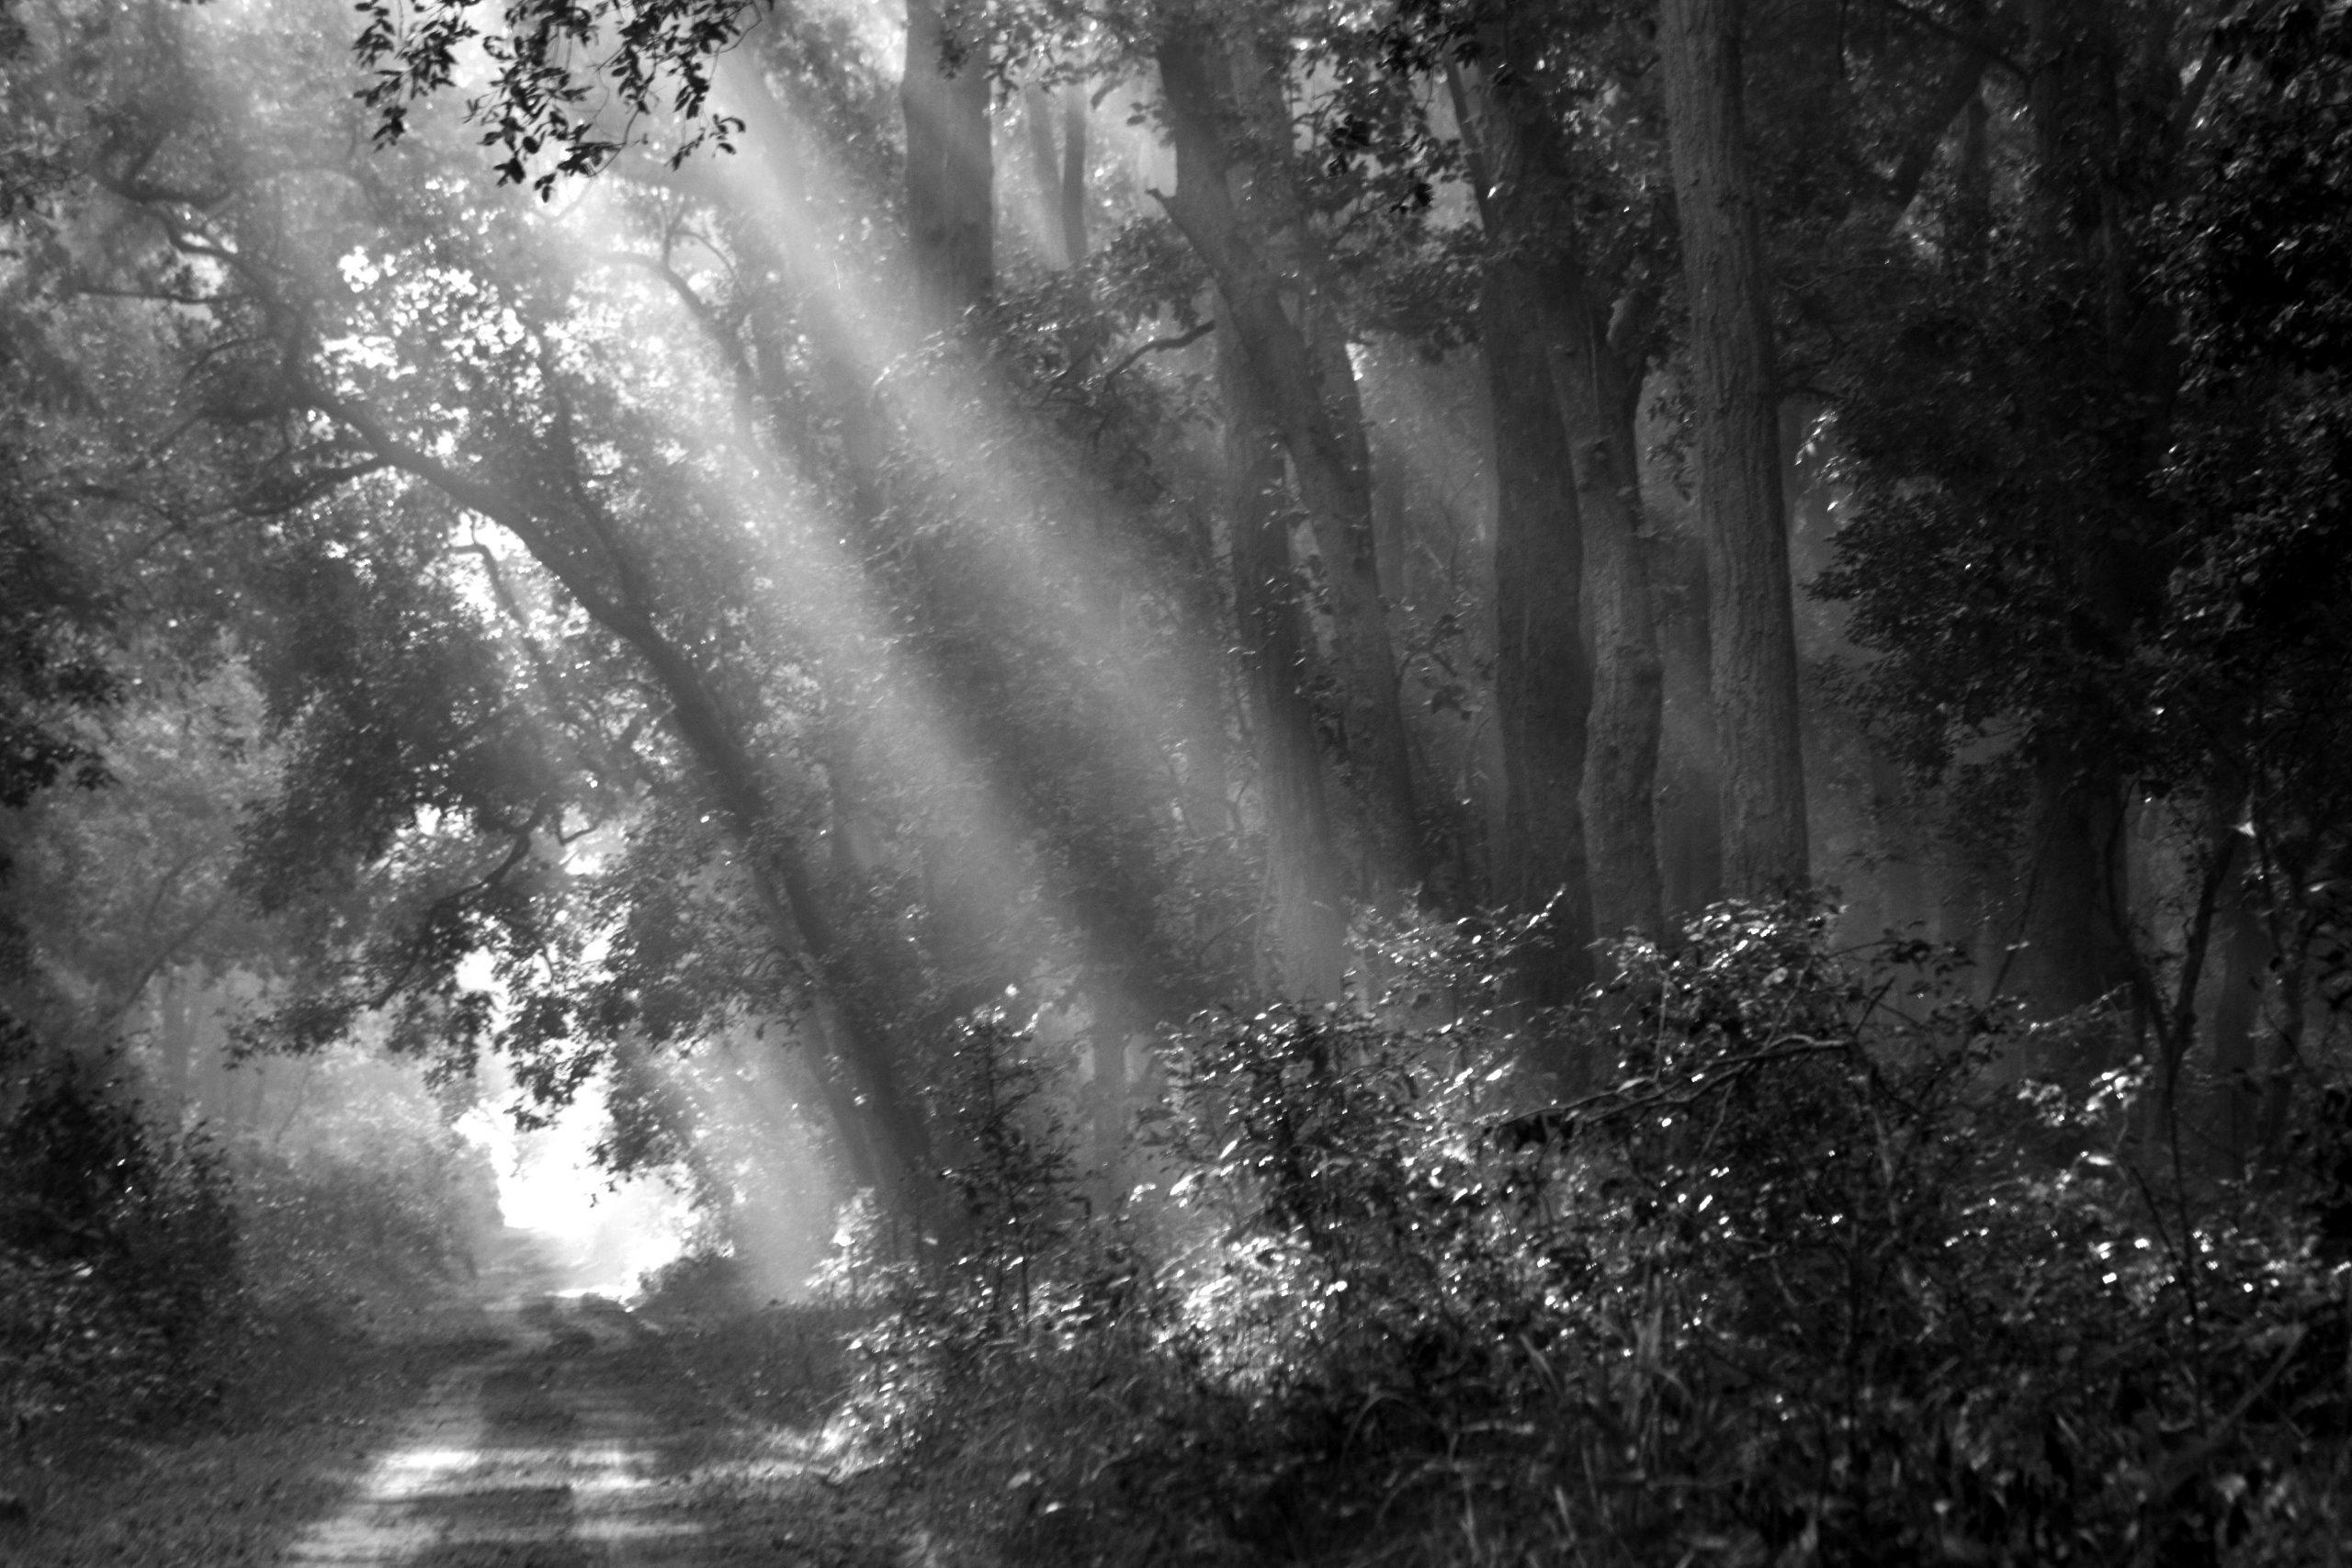 Sunrays falling through trees